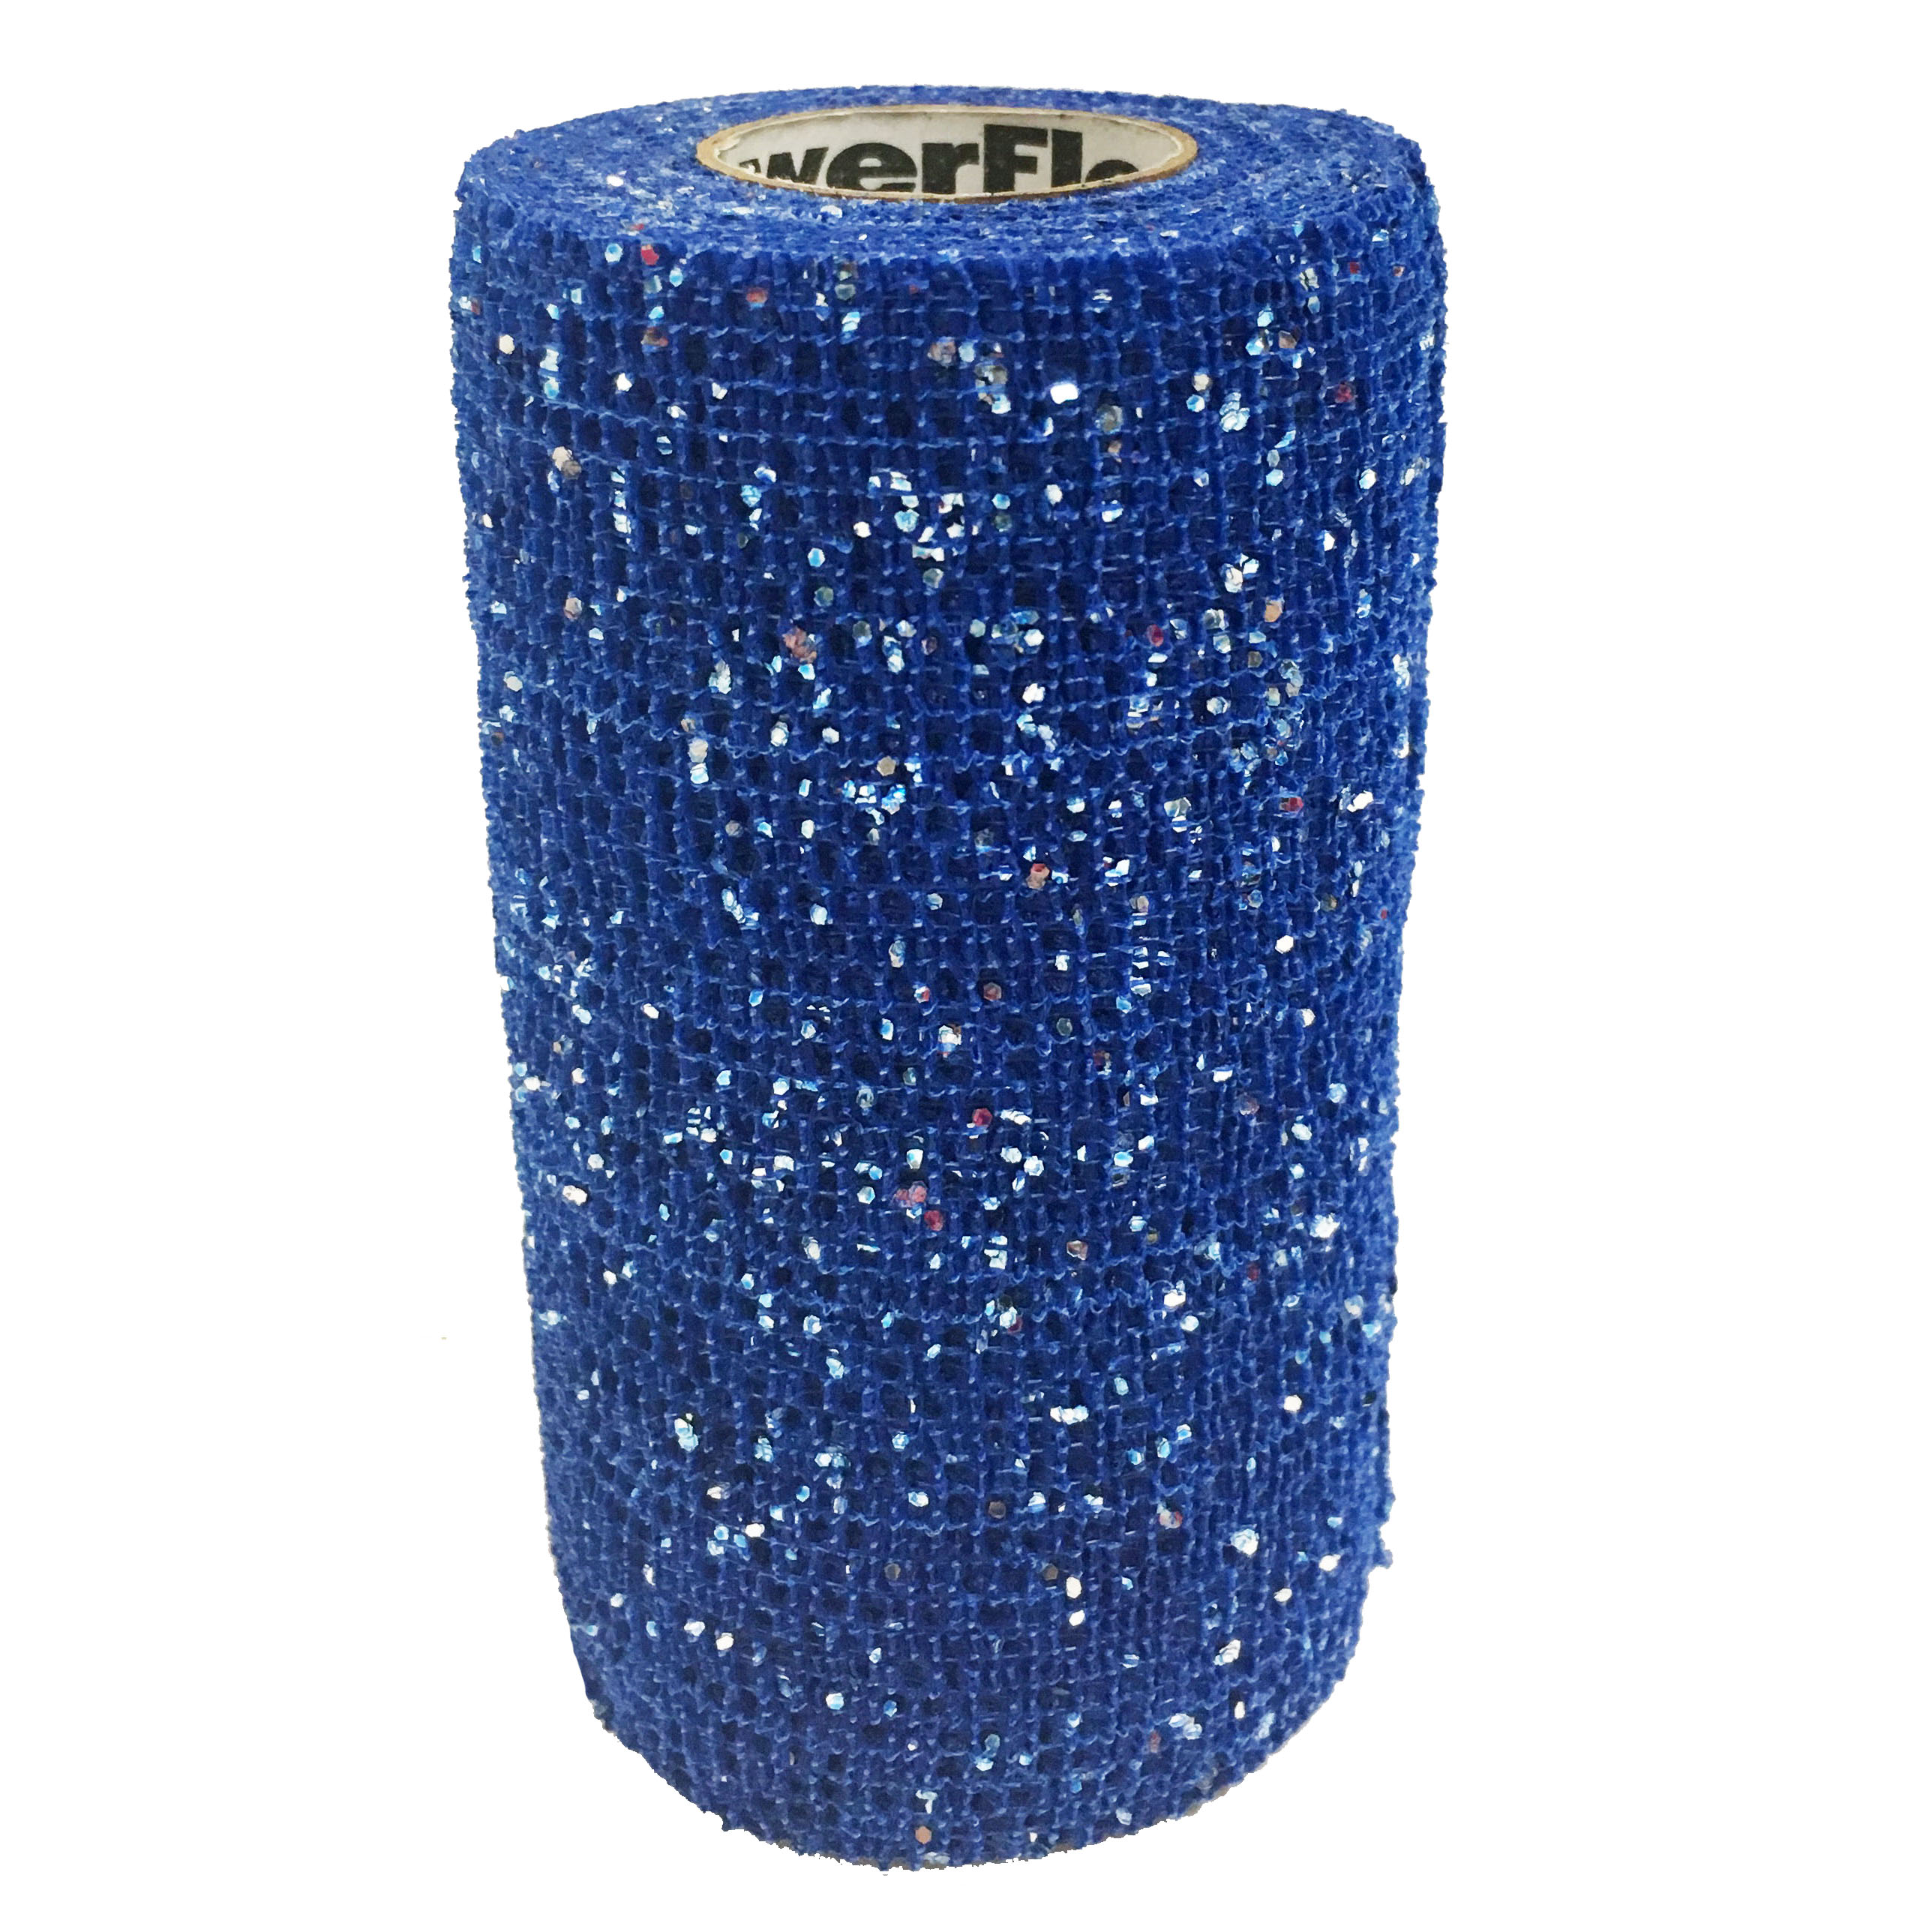 Set Of 4 Andover Powerflex Glitter Bandages Value Pack